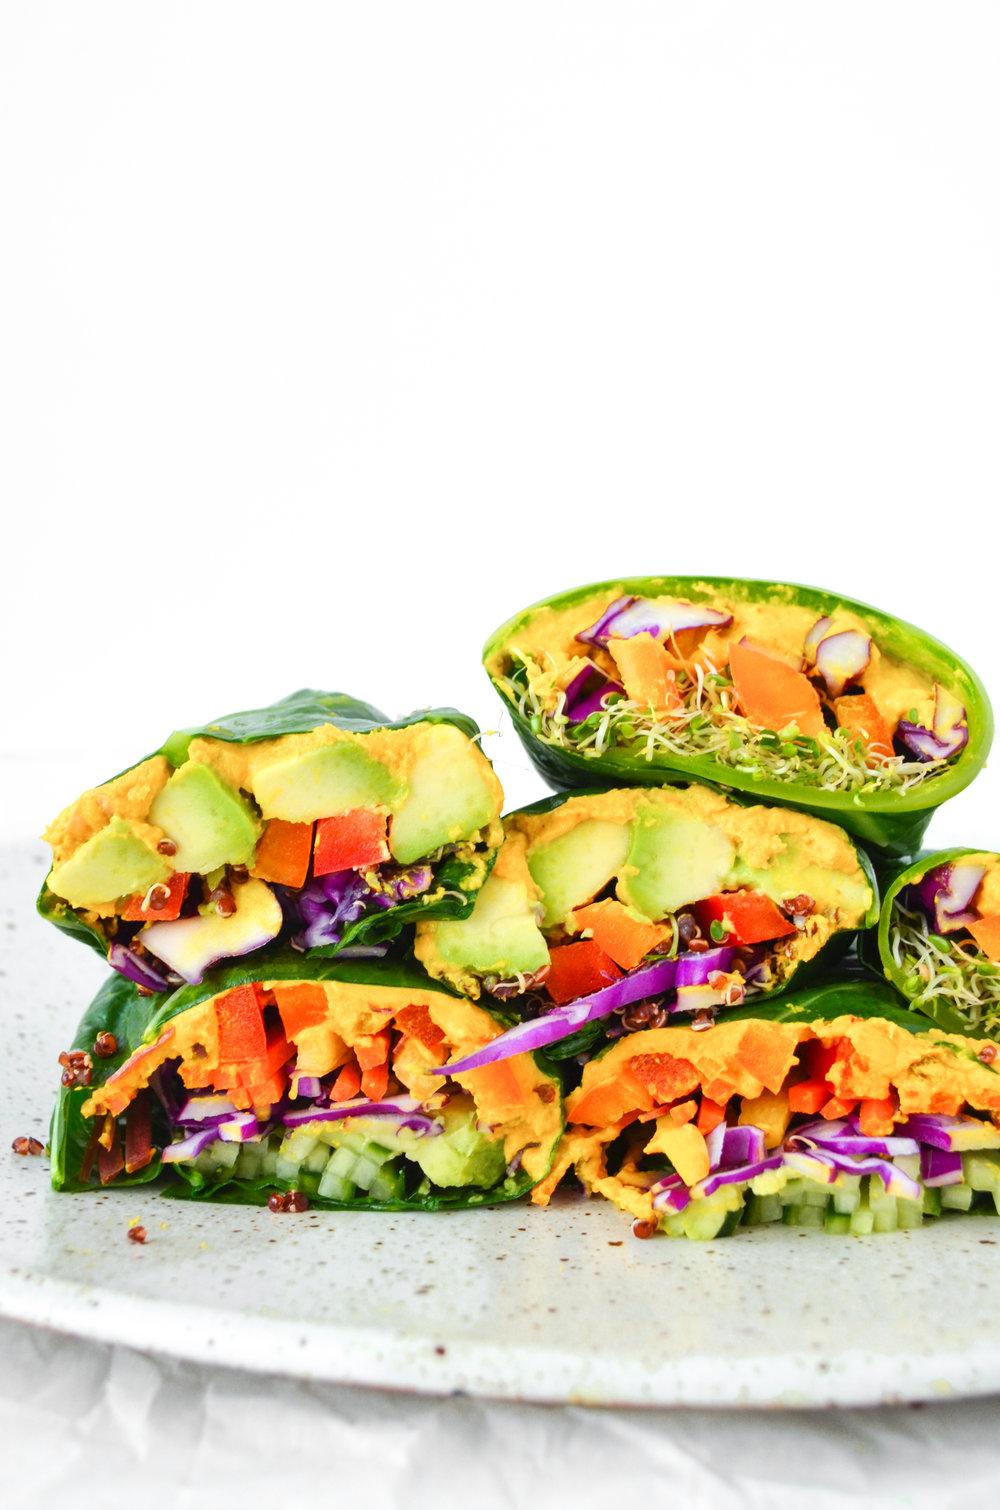 paleo collard wraps with turmeric tahini hummus // #ShiraRD #paleo #refinedsugarfree #SnacksbyShira